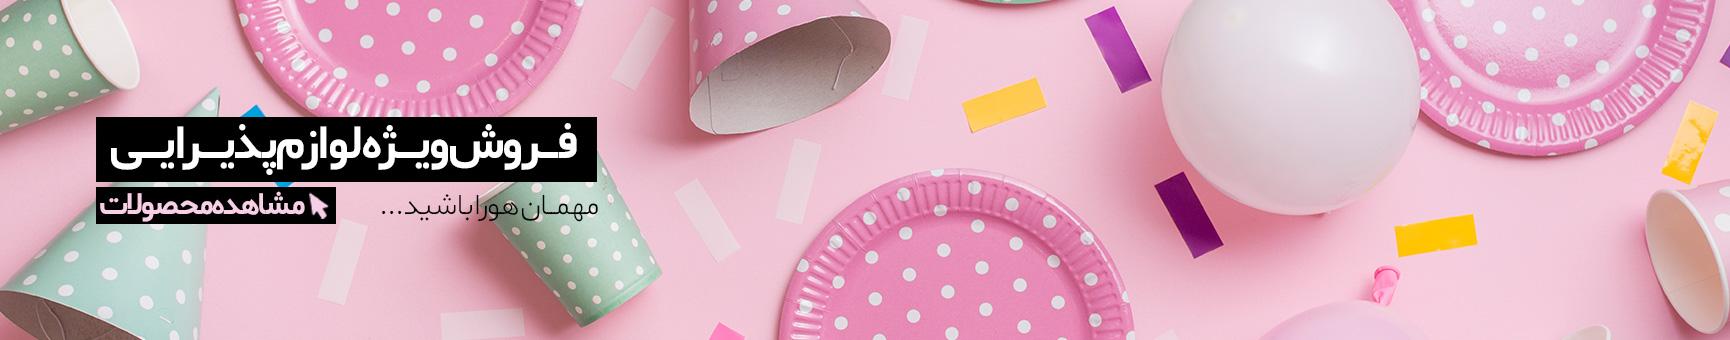 فروش لوازم پذیرایی - هورا-لوازم جشن و تولد